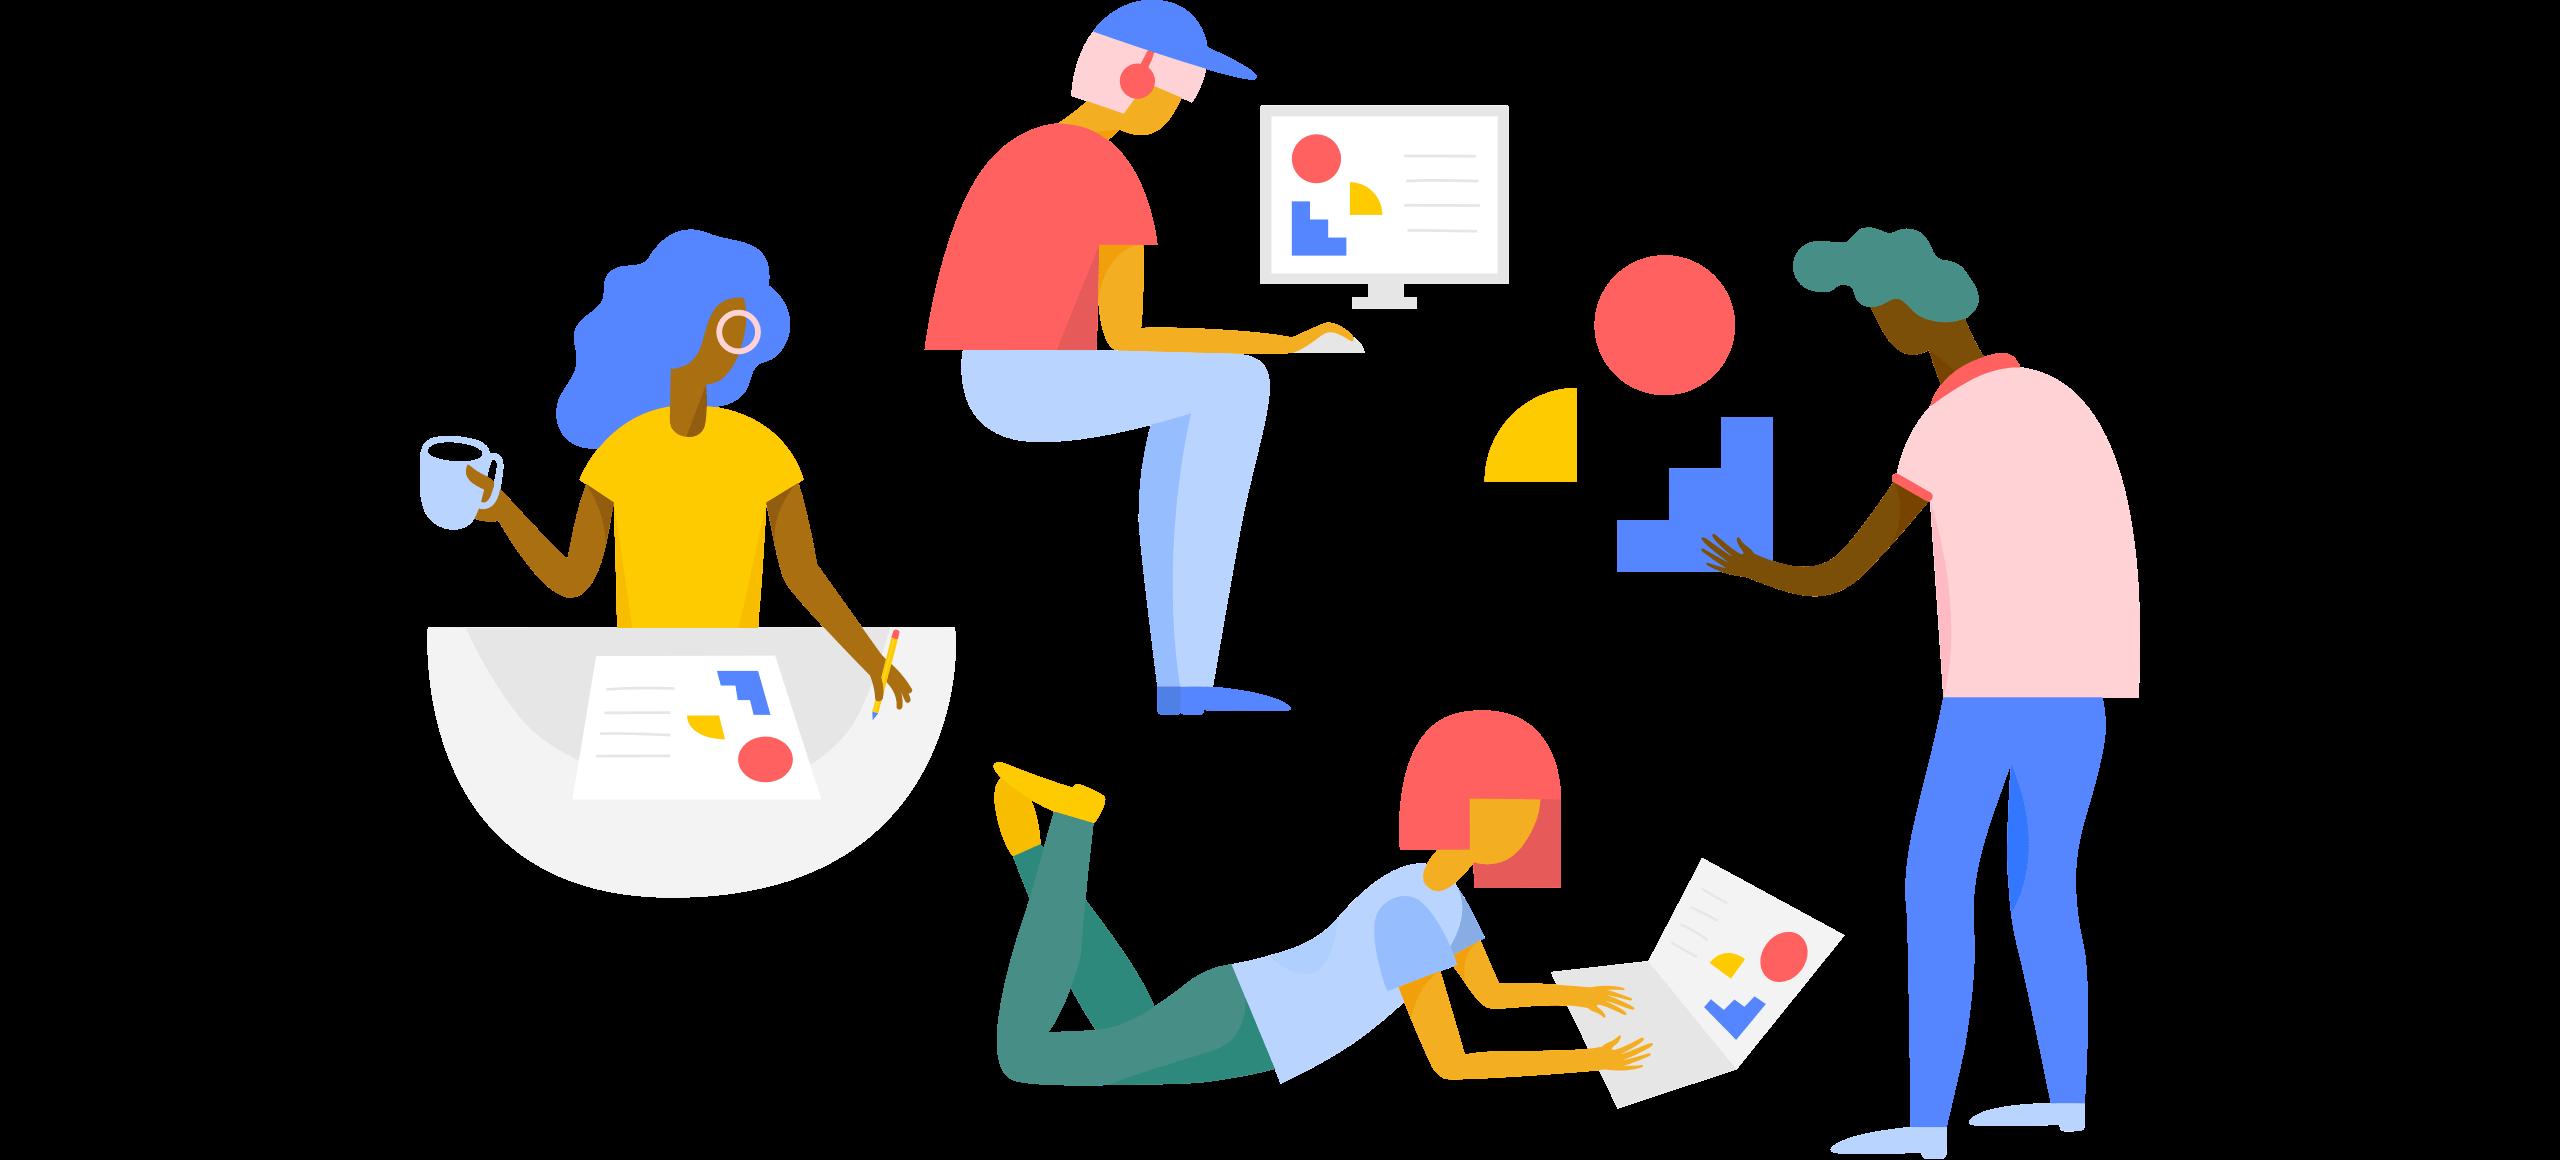 Teamwork clipart group 4. A design library made